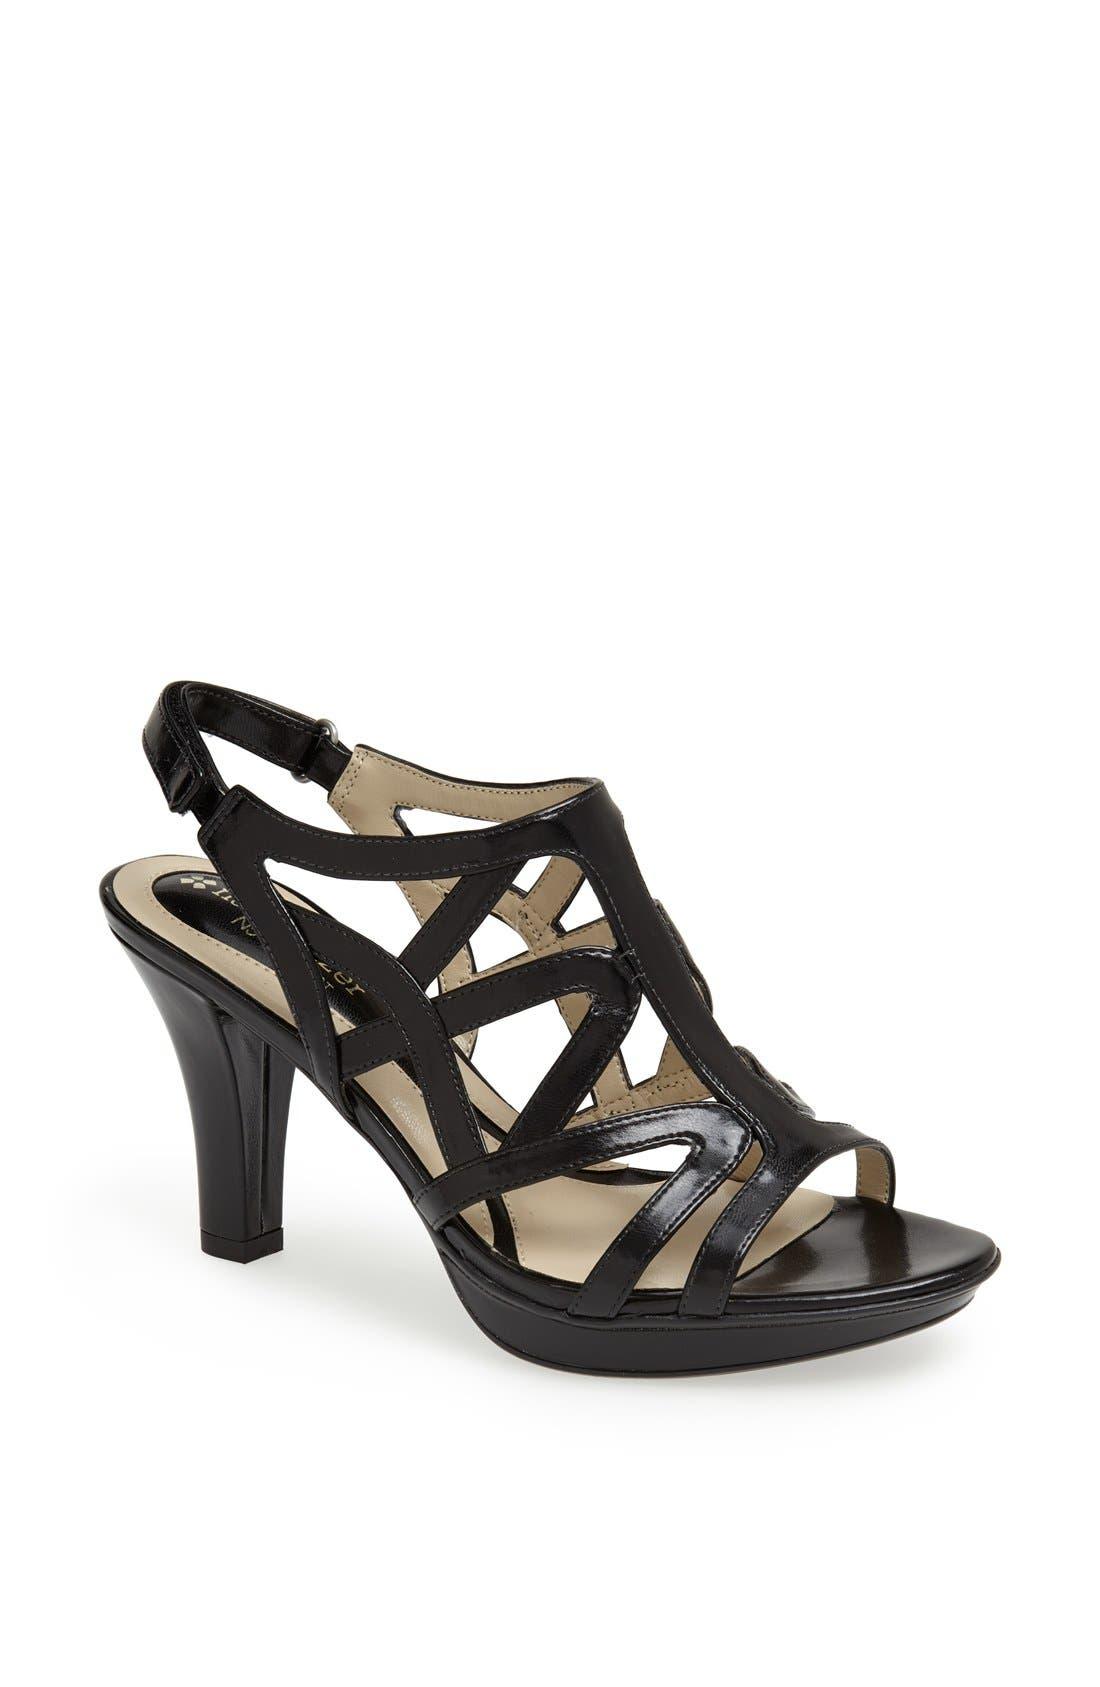 37c2ae00a9a4eb Naturalizer Sandals - Women s